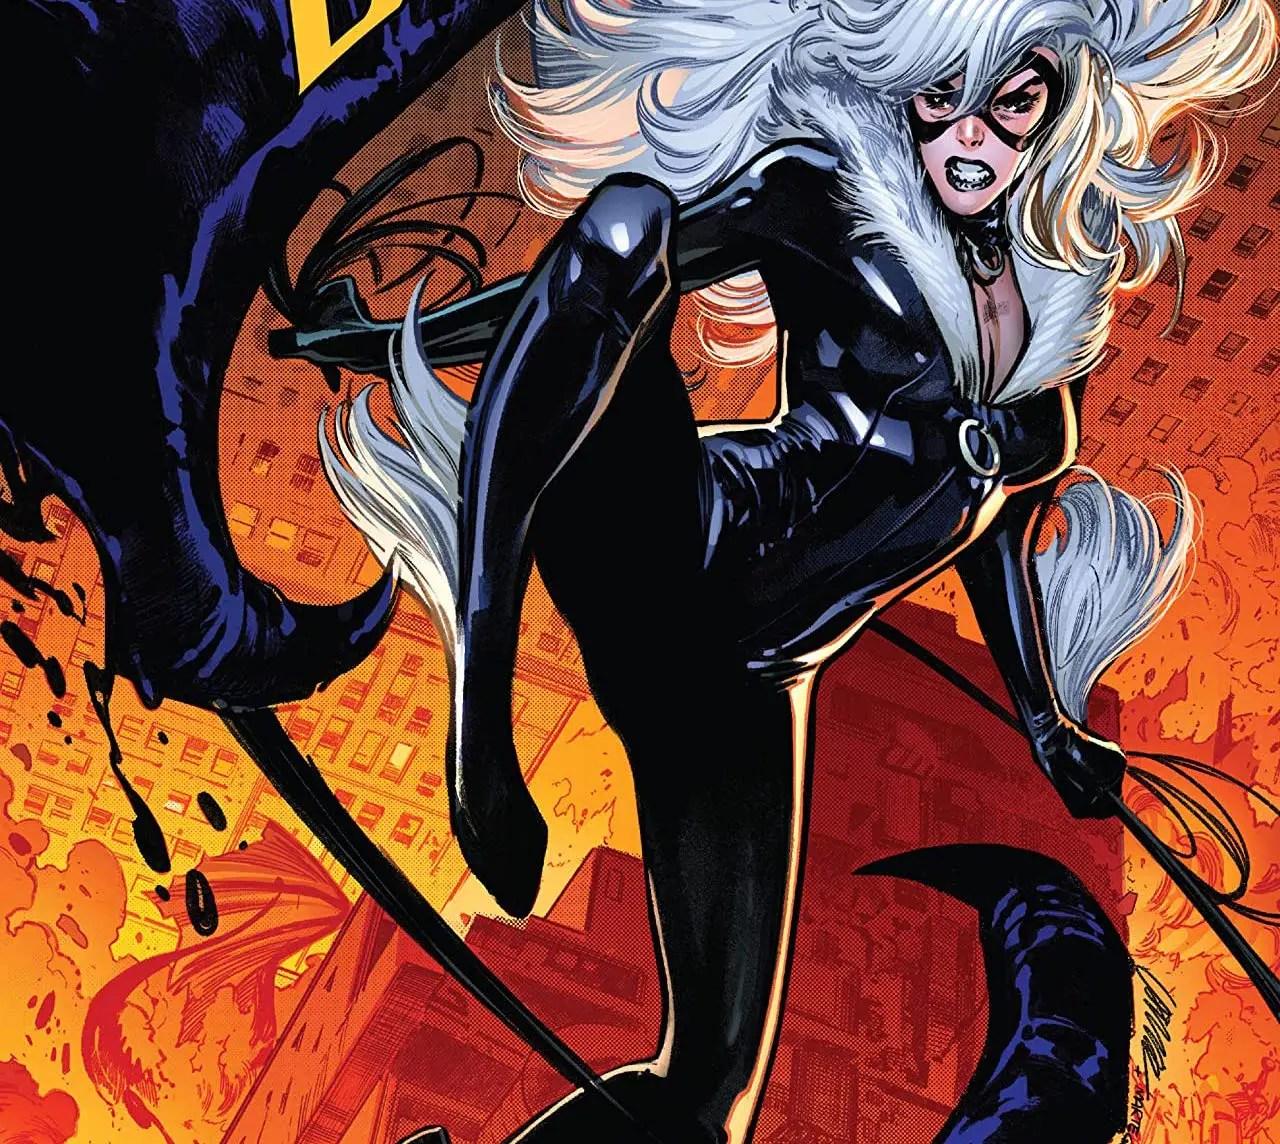 'Black Cat Vol. 4: Queen in Black' gets to the core of Black Cat